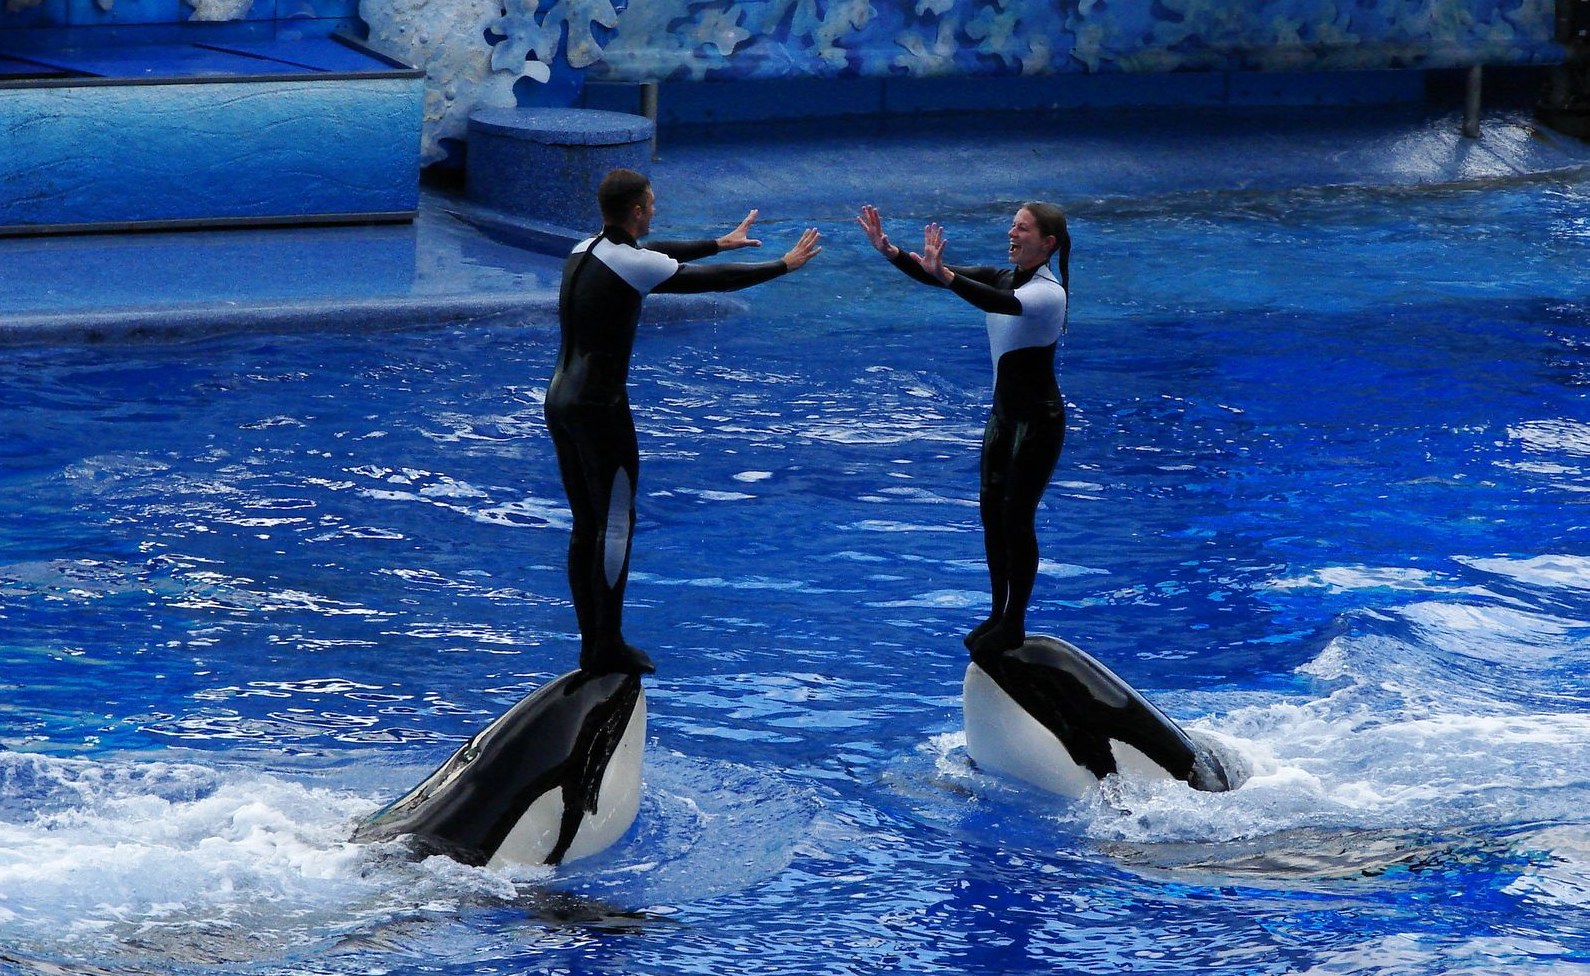 SeaWorld Orlando - The Most Interesting Ocean Park in Florida